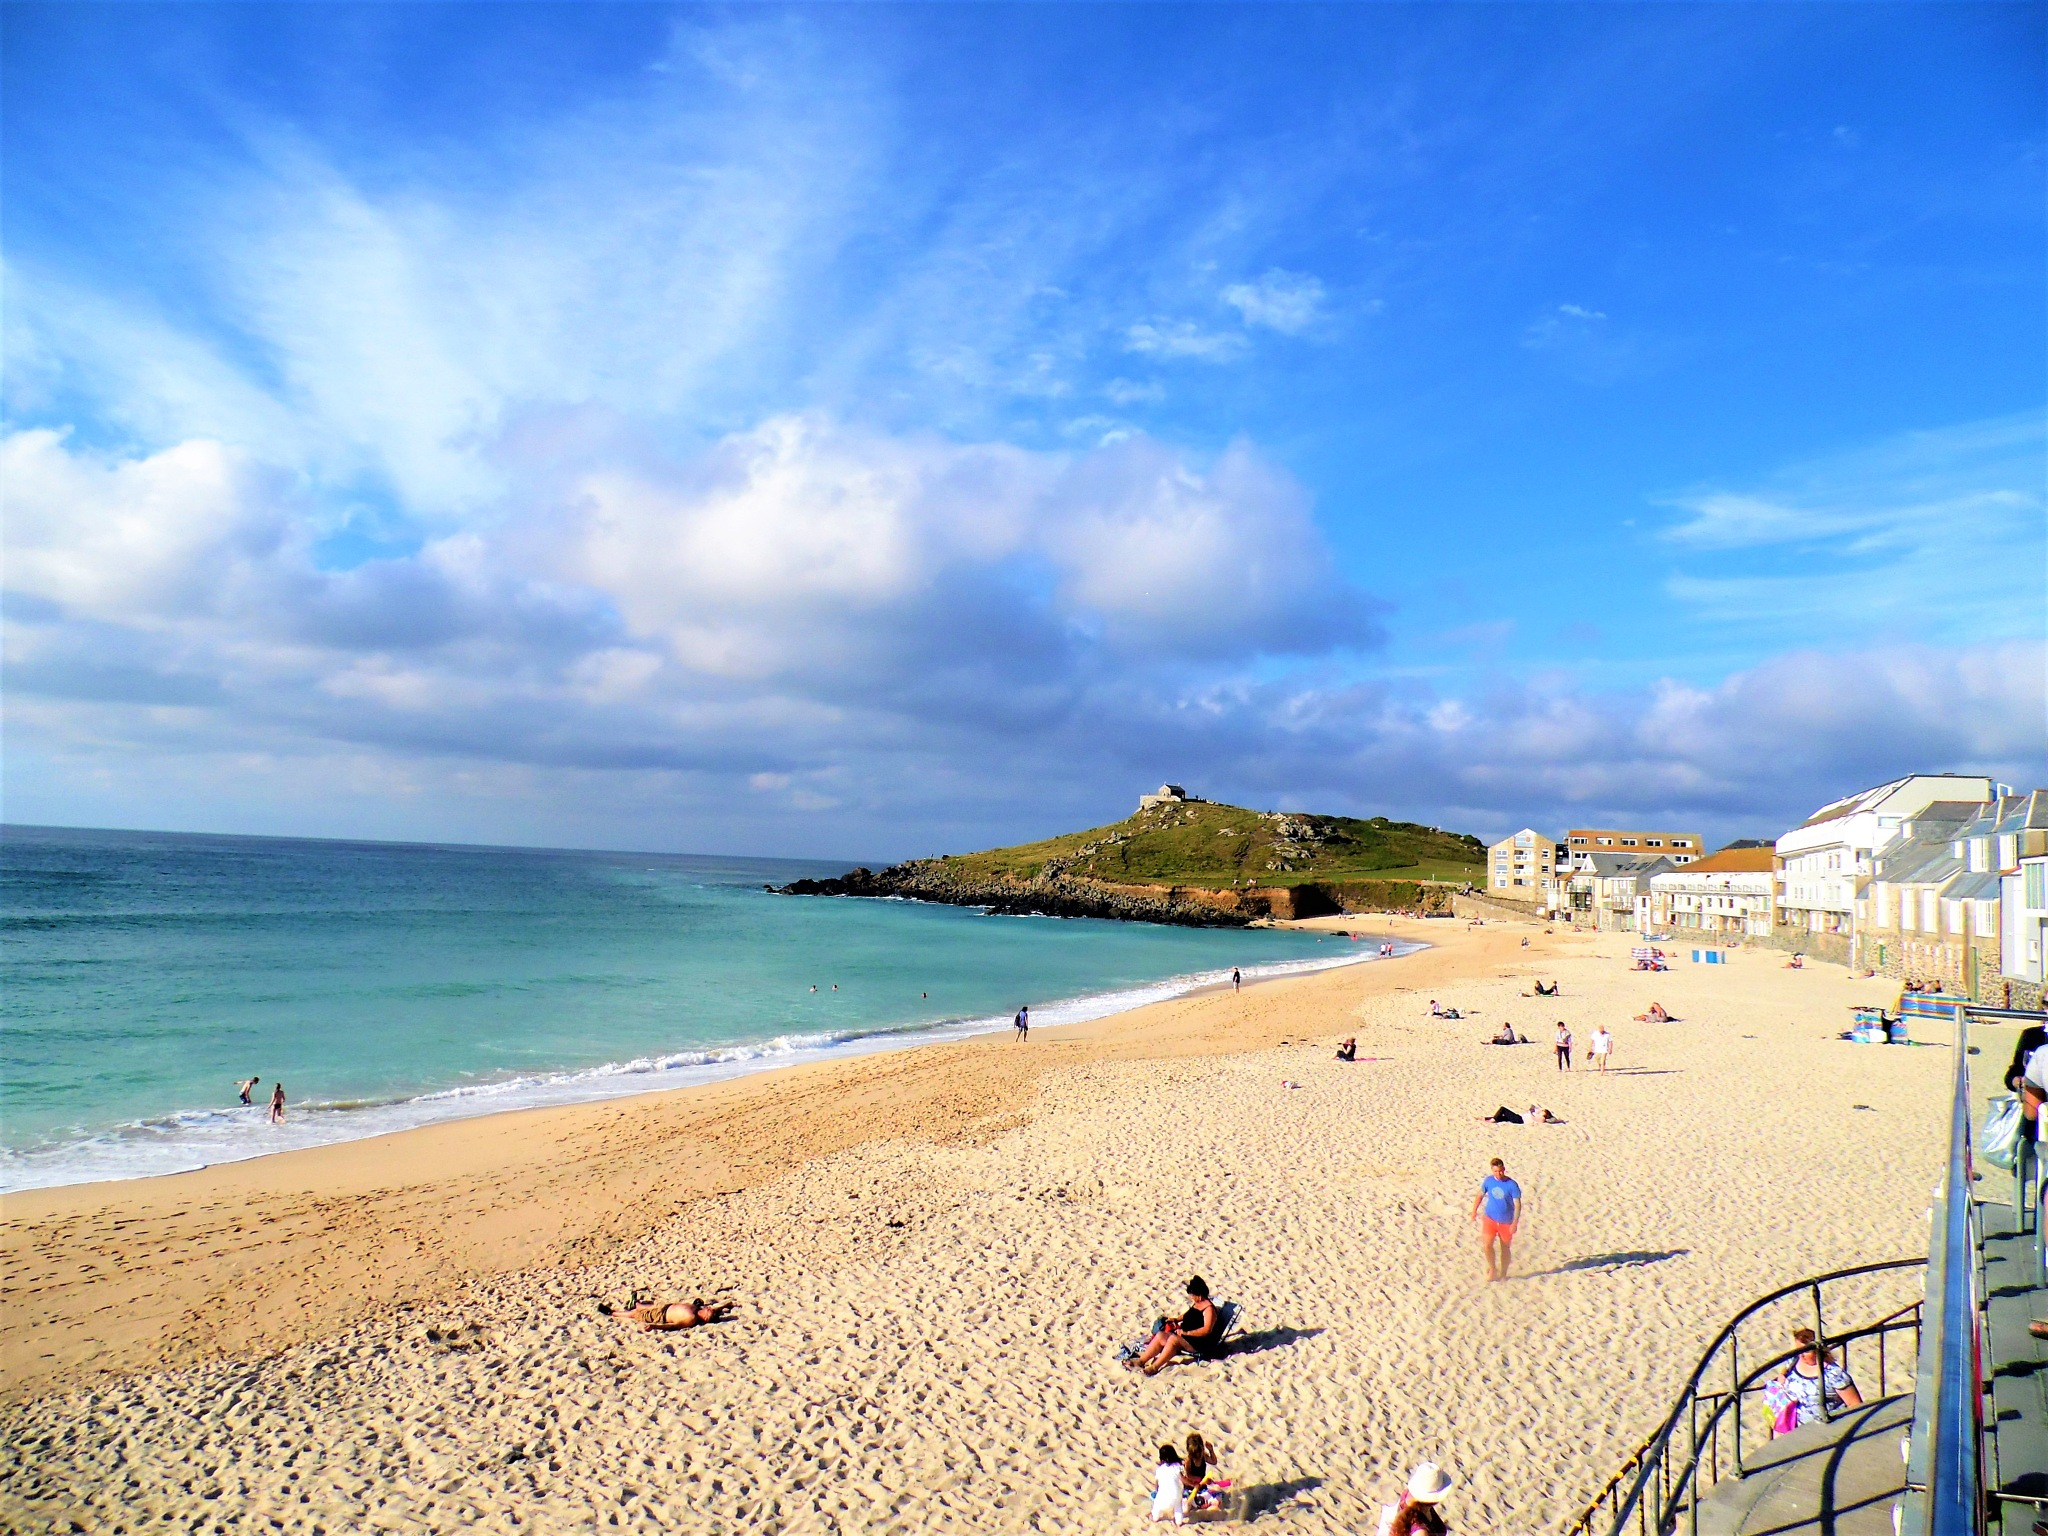 Porthmeor Beach, St Ives, Cornwall. by Sandra Wright